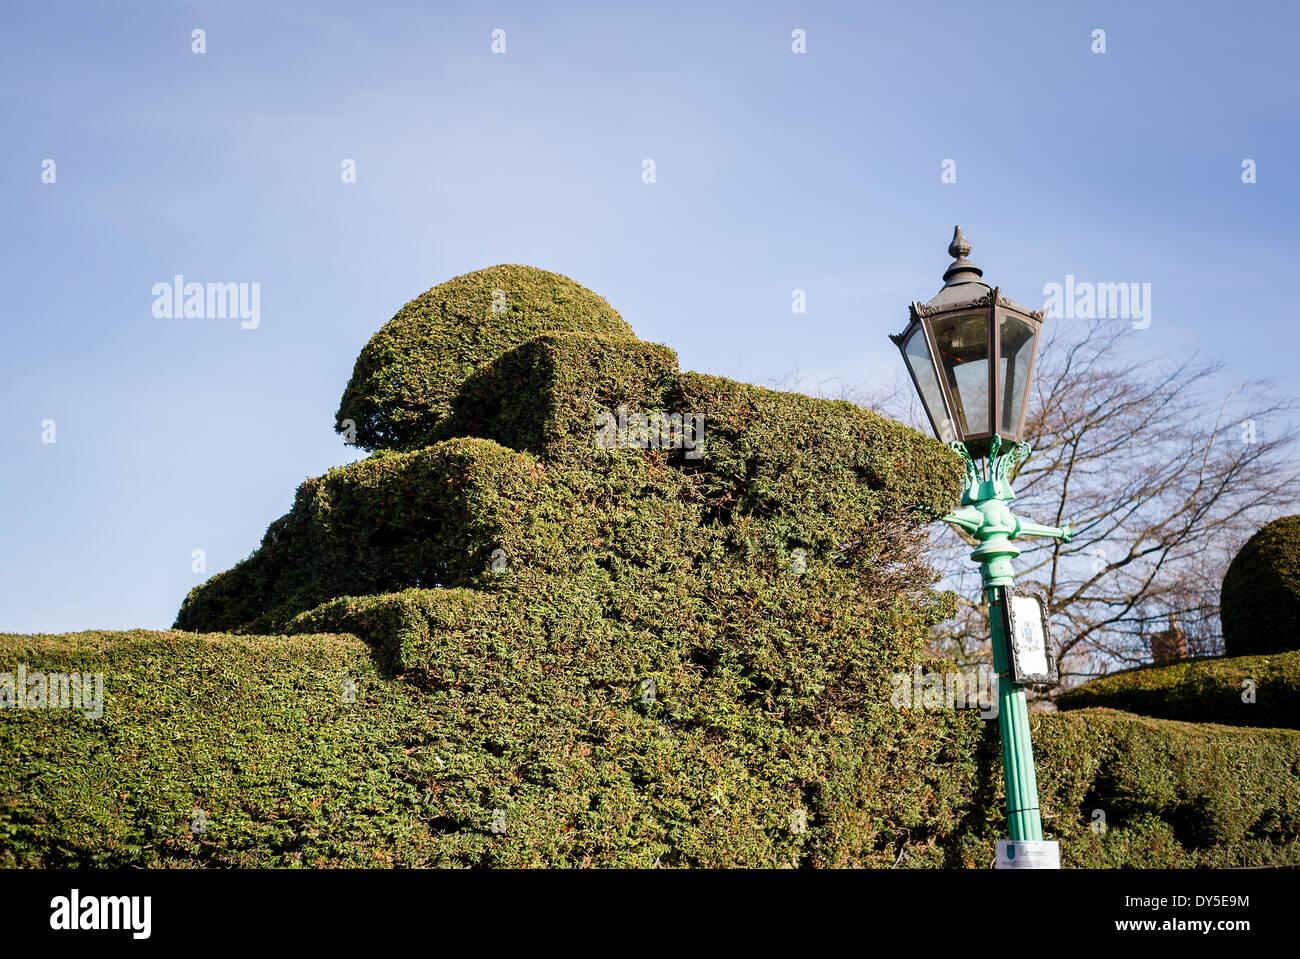 Topiary yew hedge in Stratford On Avon UK - Stock Image